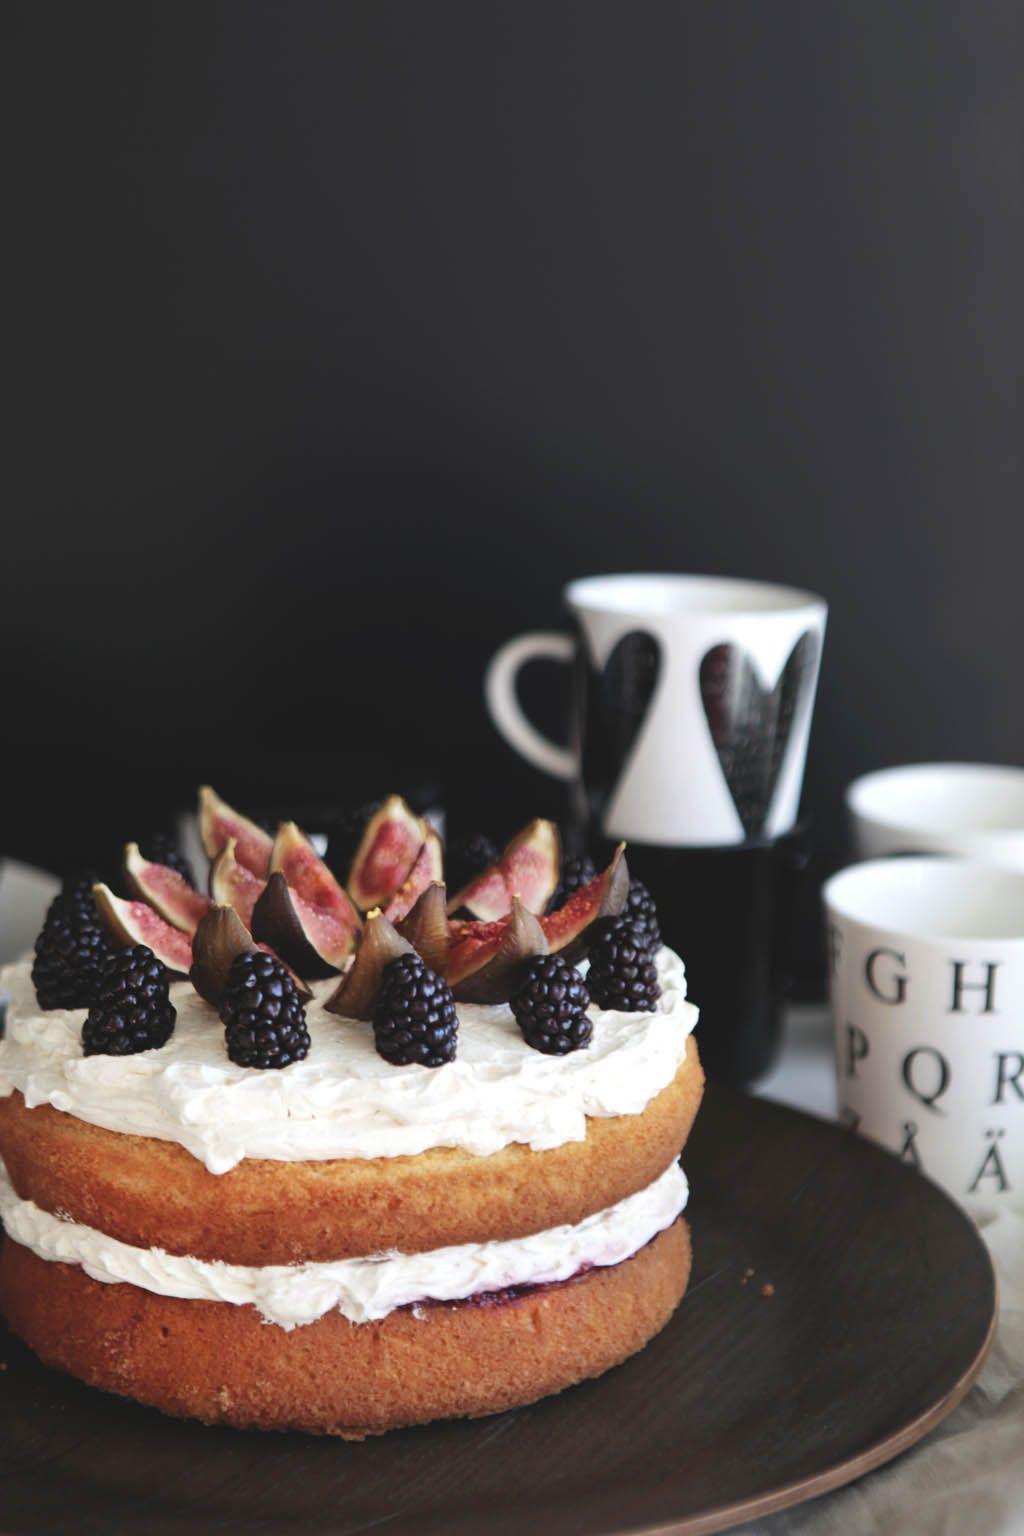 Iloleipuri - Naked sponge cake